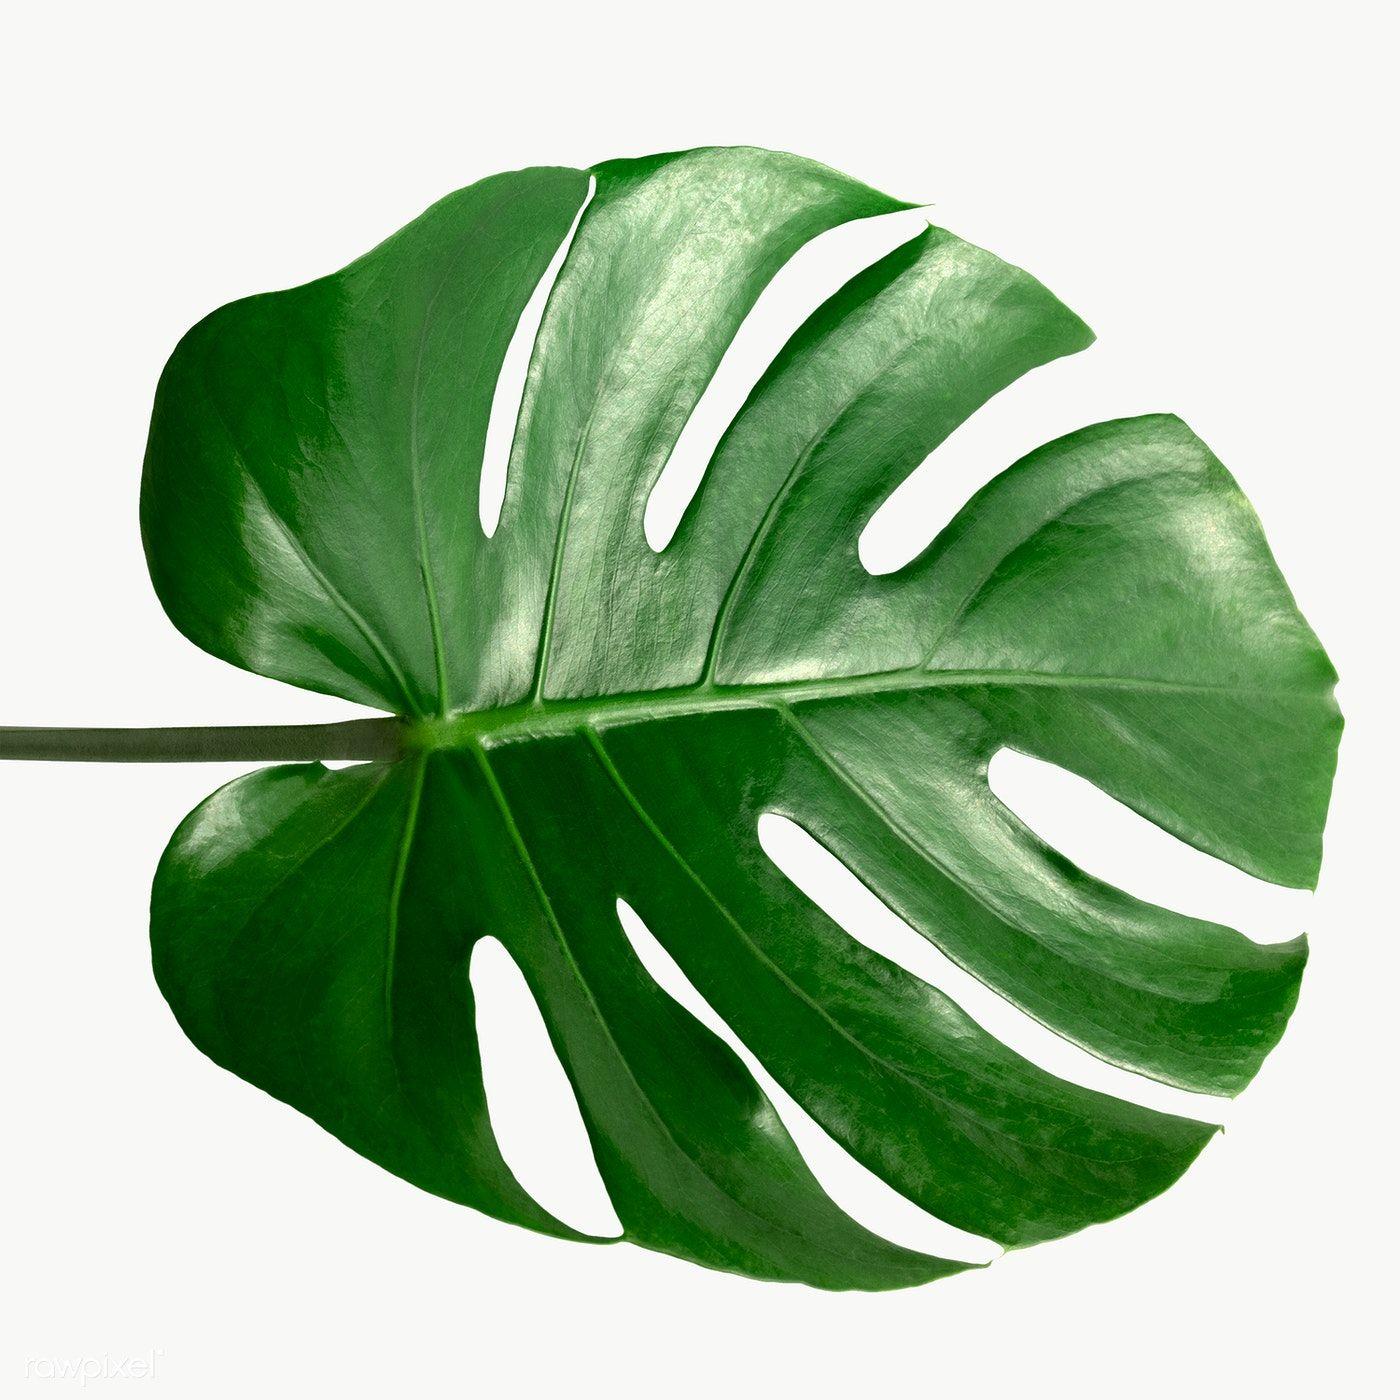 Split Leaf Philodendron Monstera Plant Element Transparent Png Free Image By Rawpixel Com Teddy Rawpixel Monstera Philodendron Philodendron Monstera